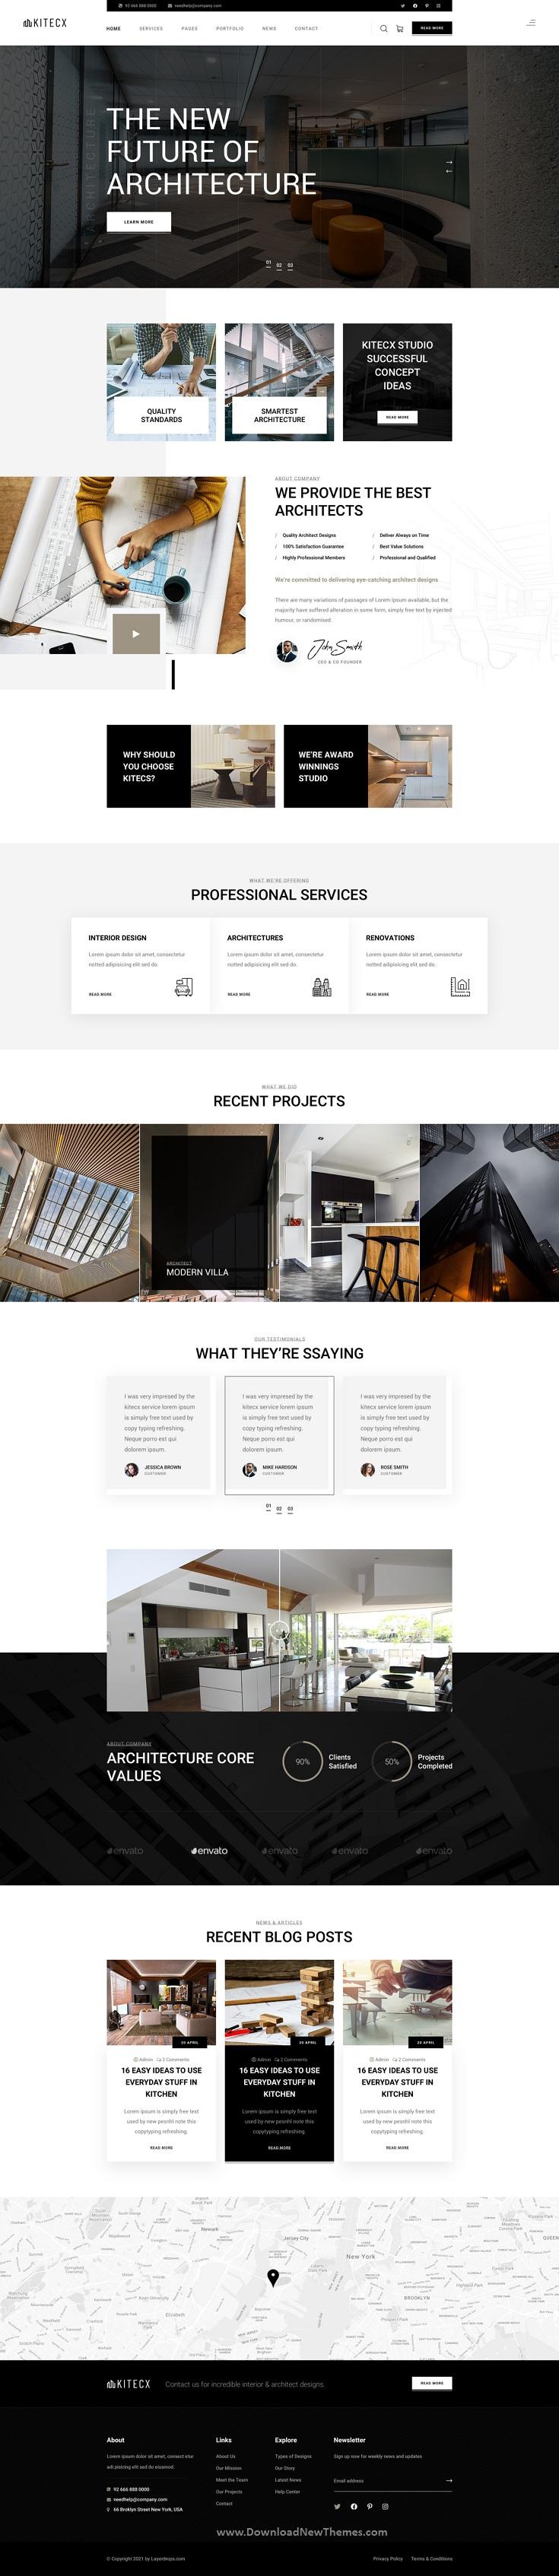 Architecture & Interior Photoshop Template